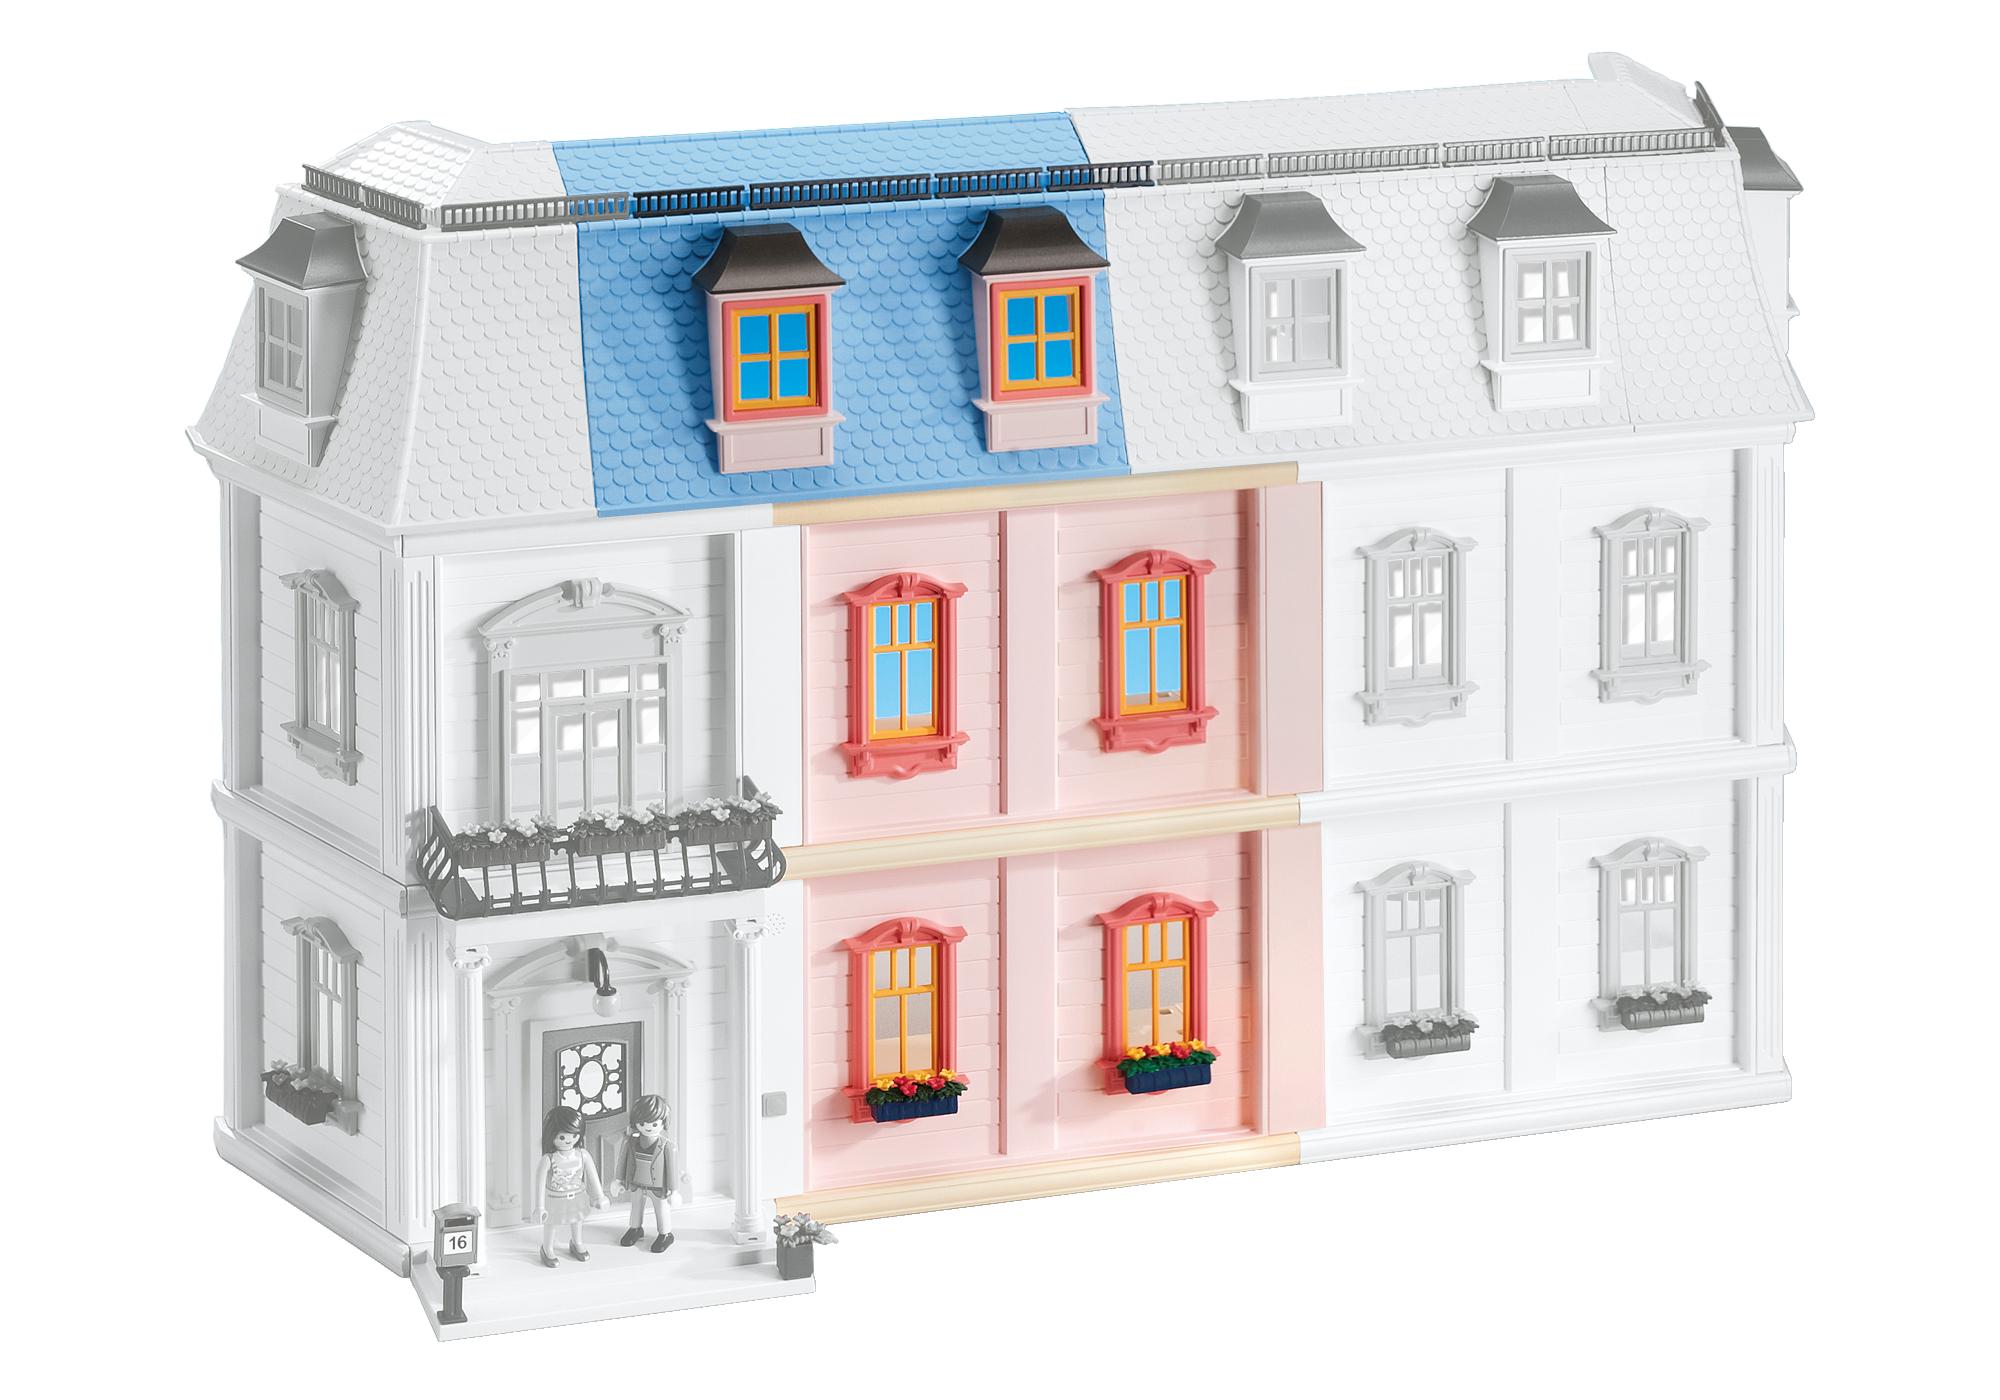 http://media.playmobil.com/i/playmobil/6452_product_detail/Uitbreidingsset A voor Herenhuis